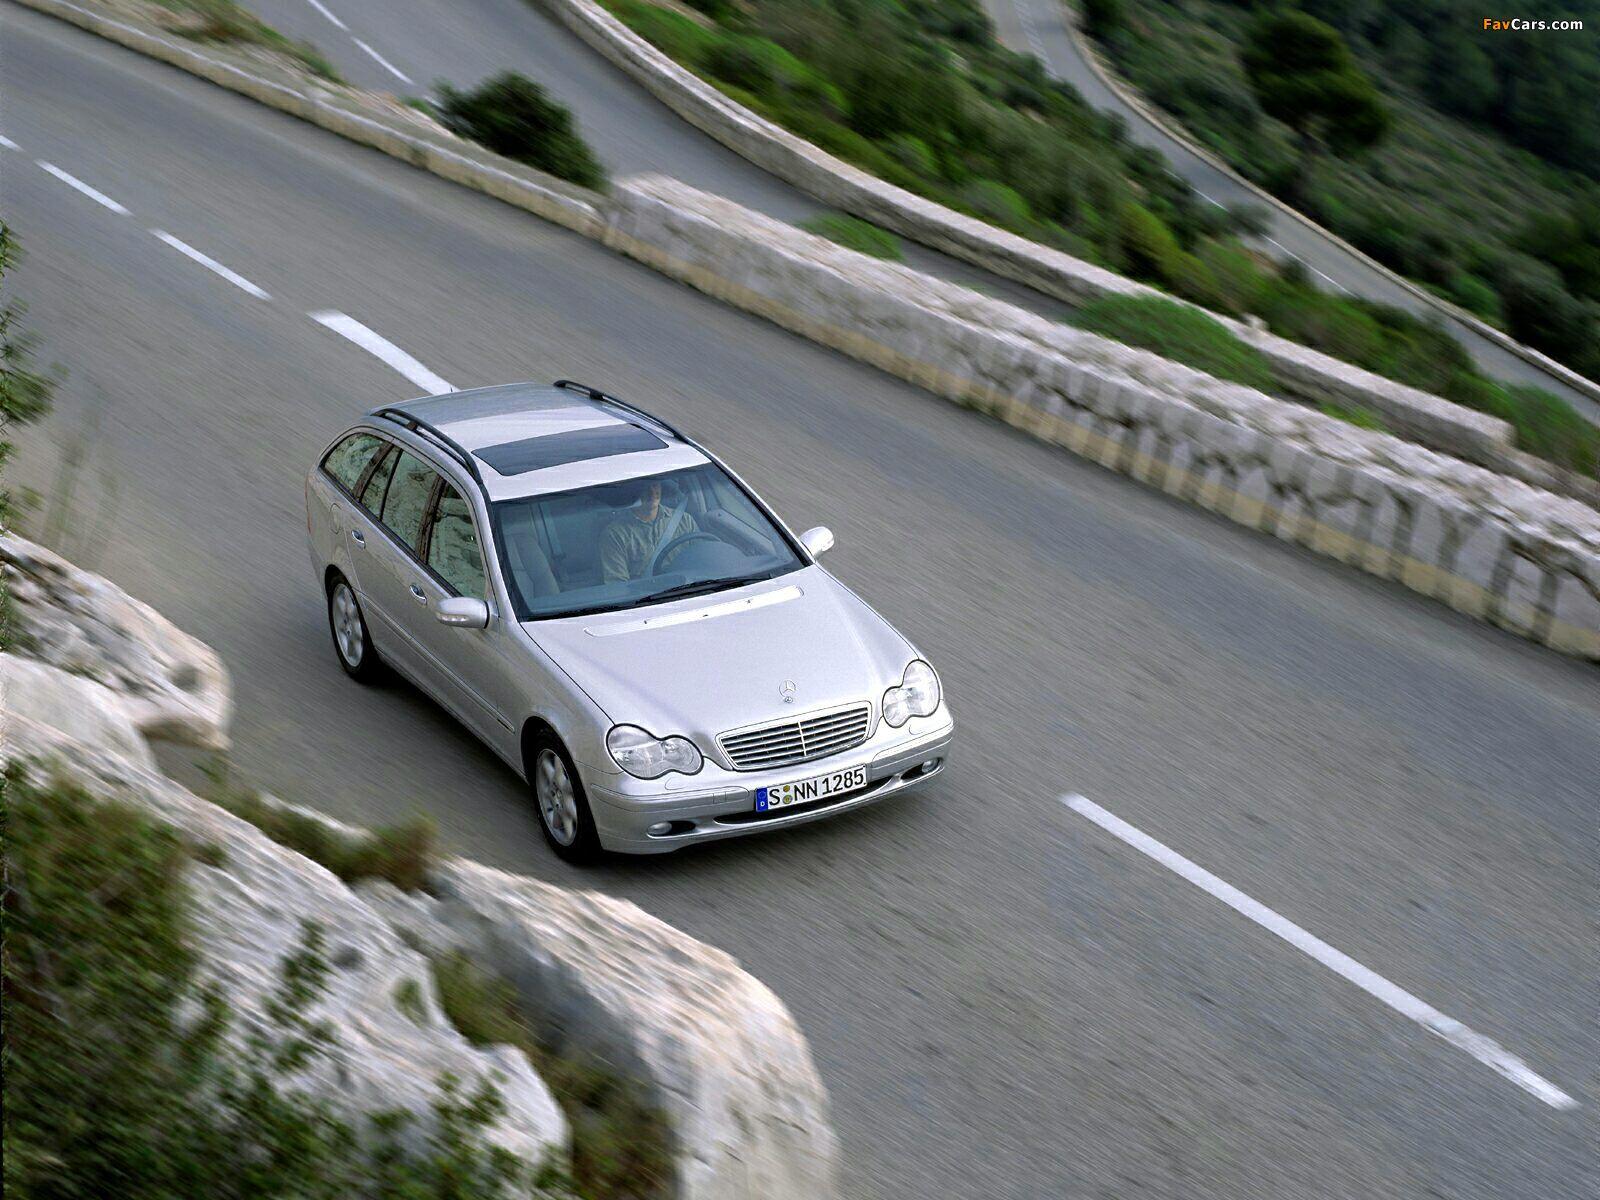 Mercedes-Benz C 270 CDI Estate (S203) 2001–05 pictures (1600 x 1200)